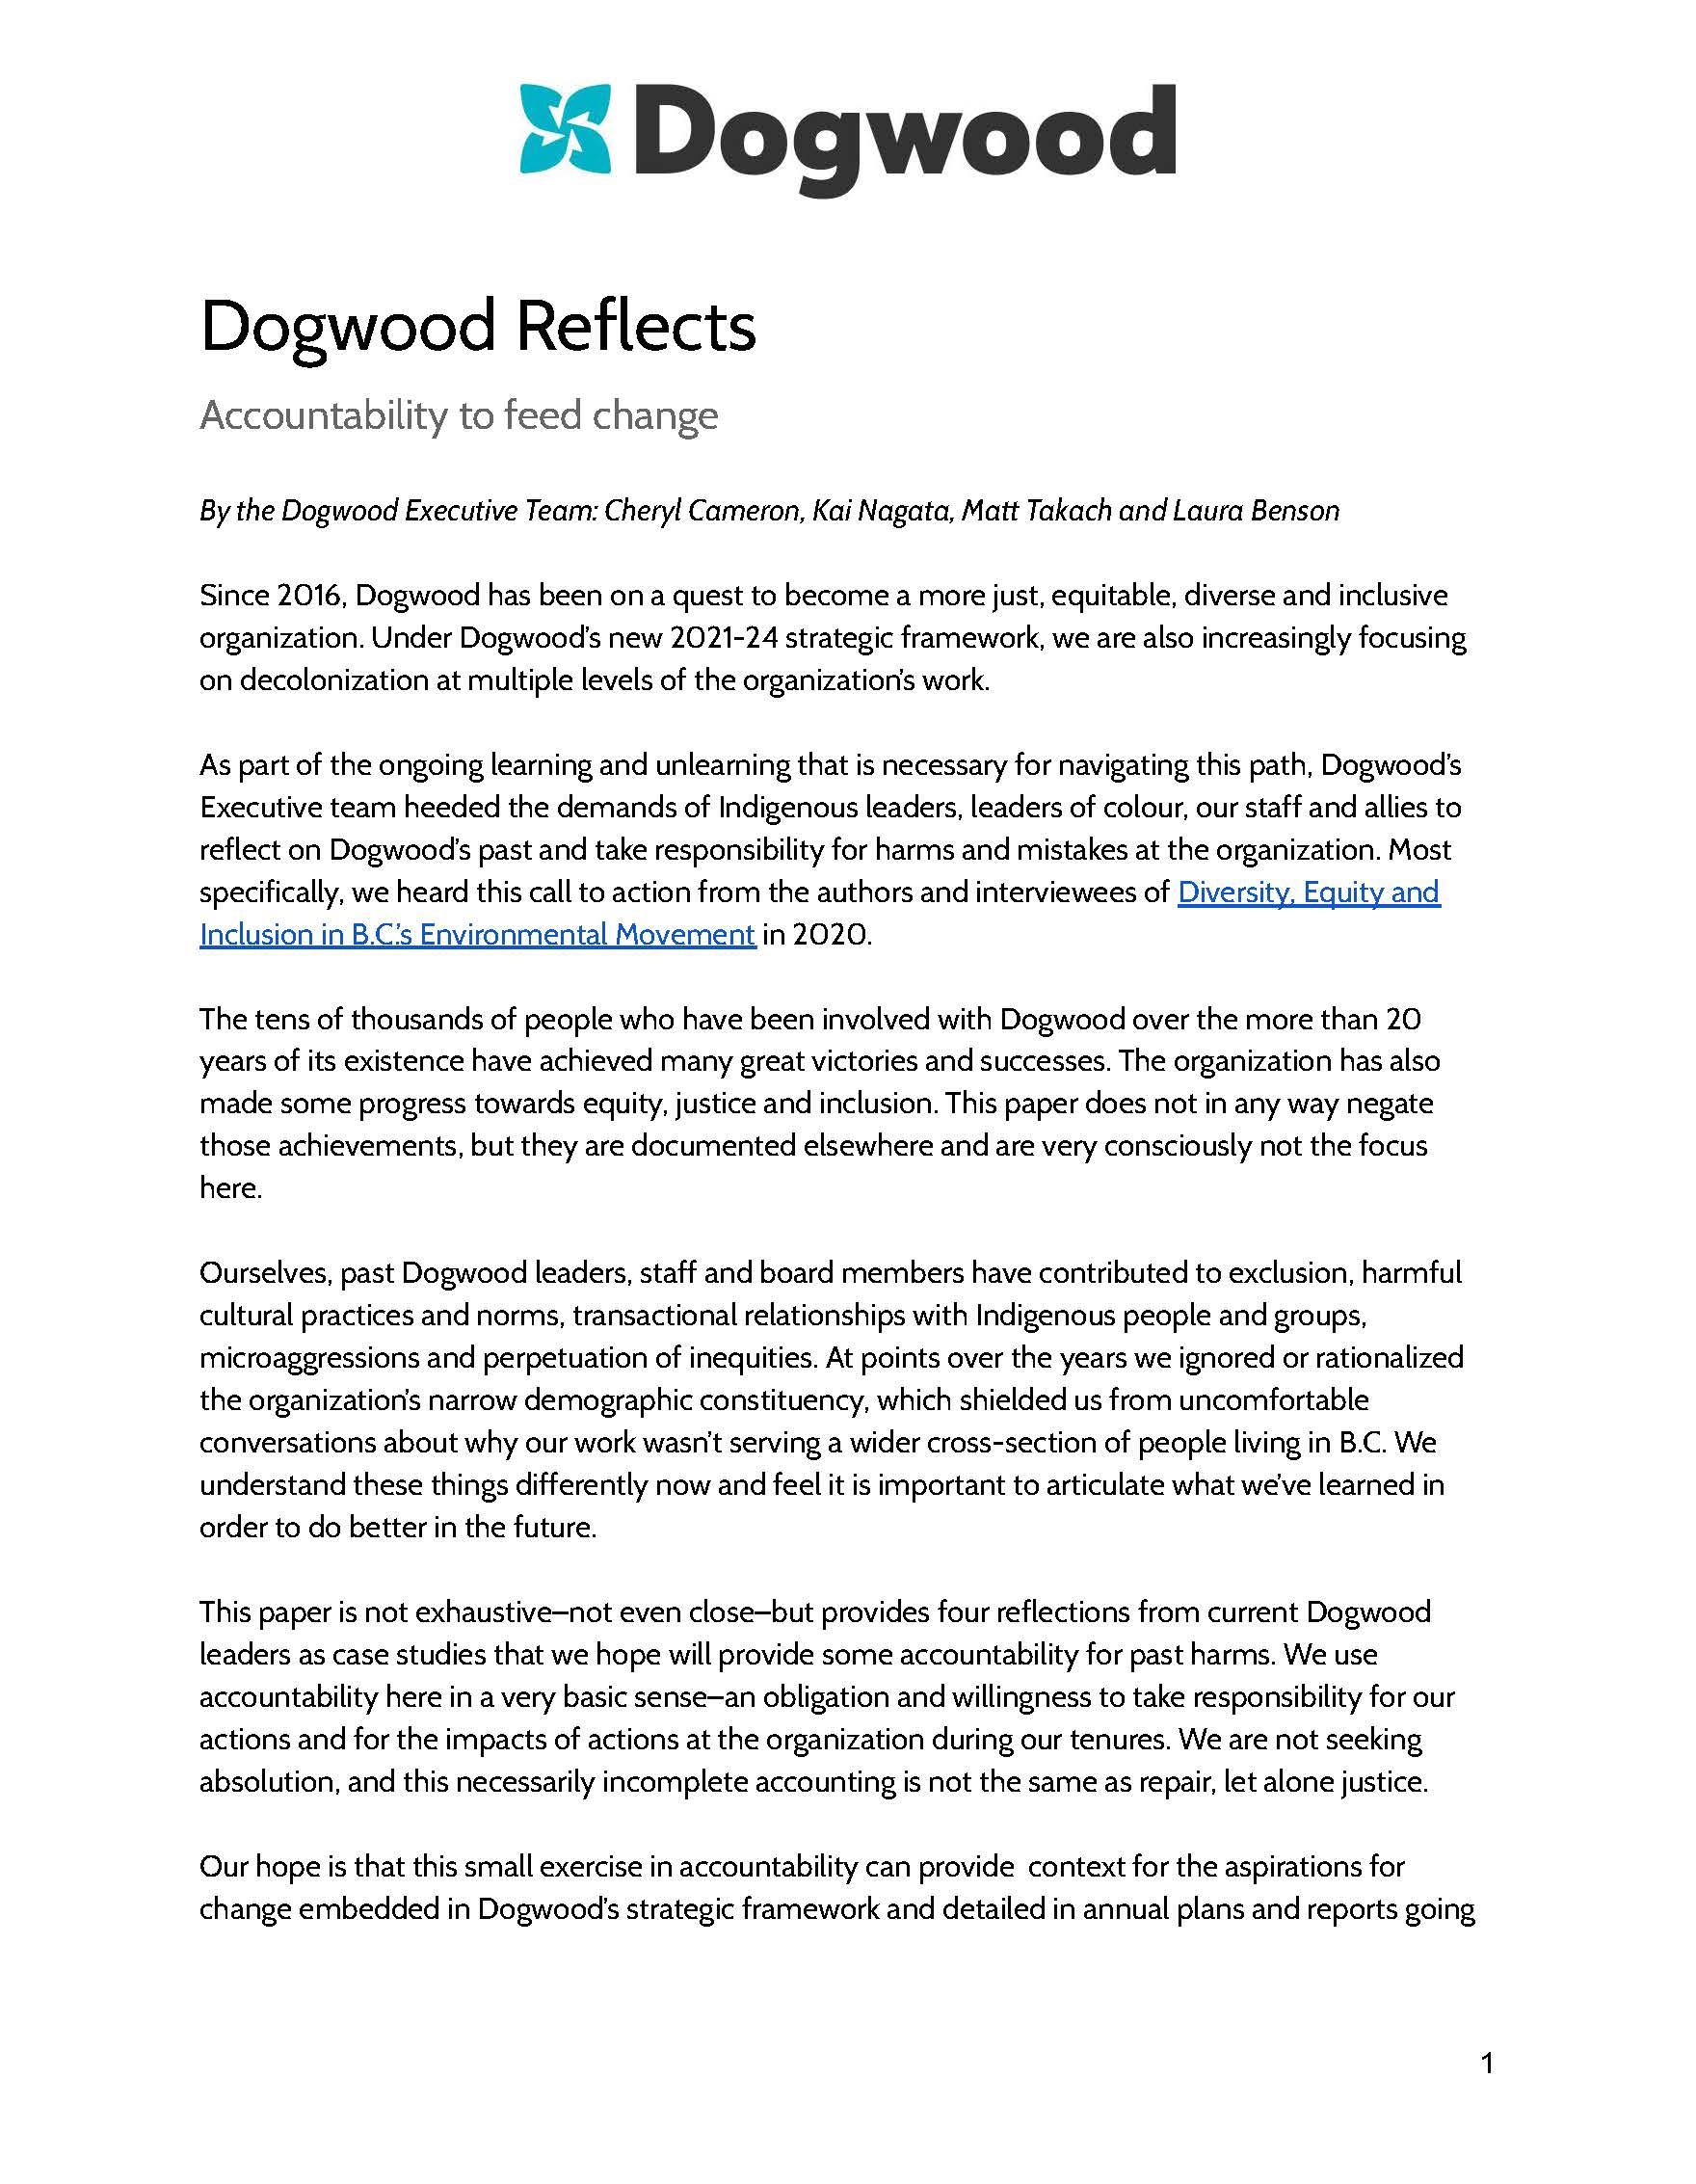 Dogwood Reflects: Accountability to feed change